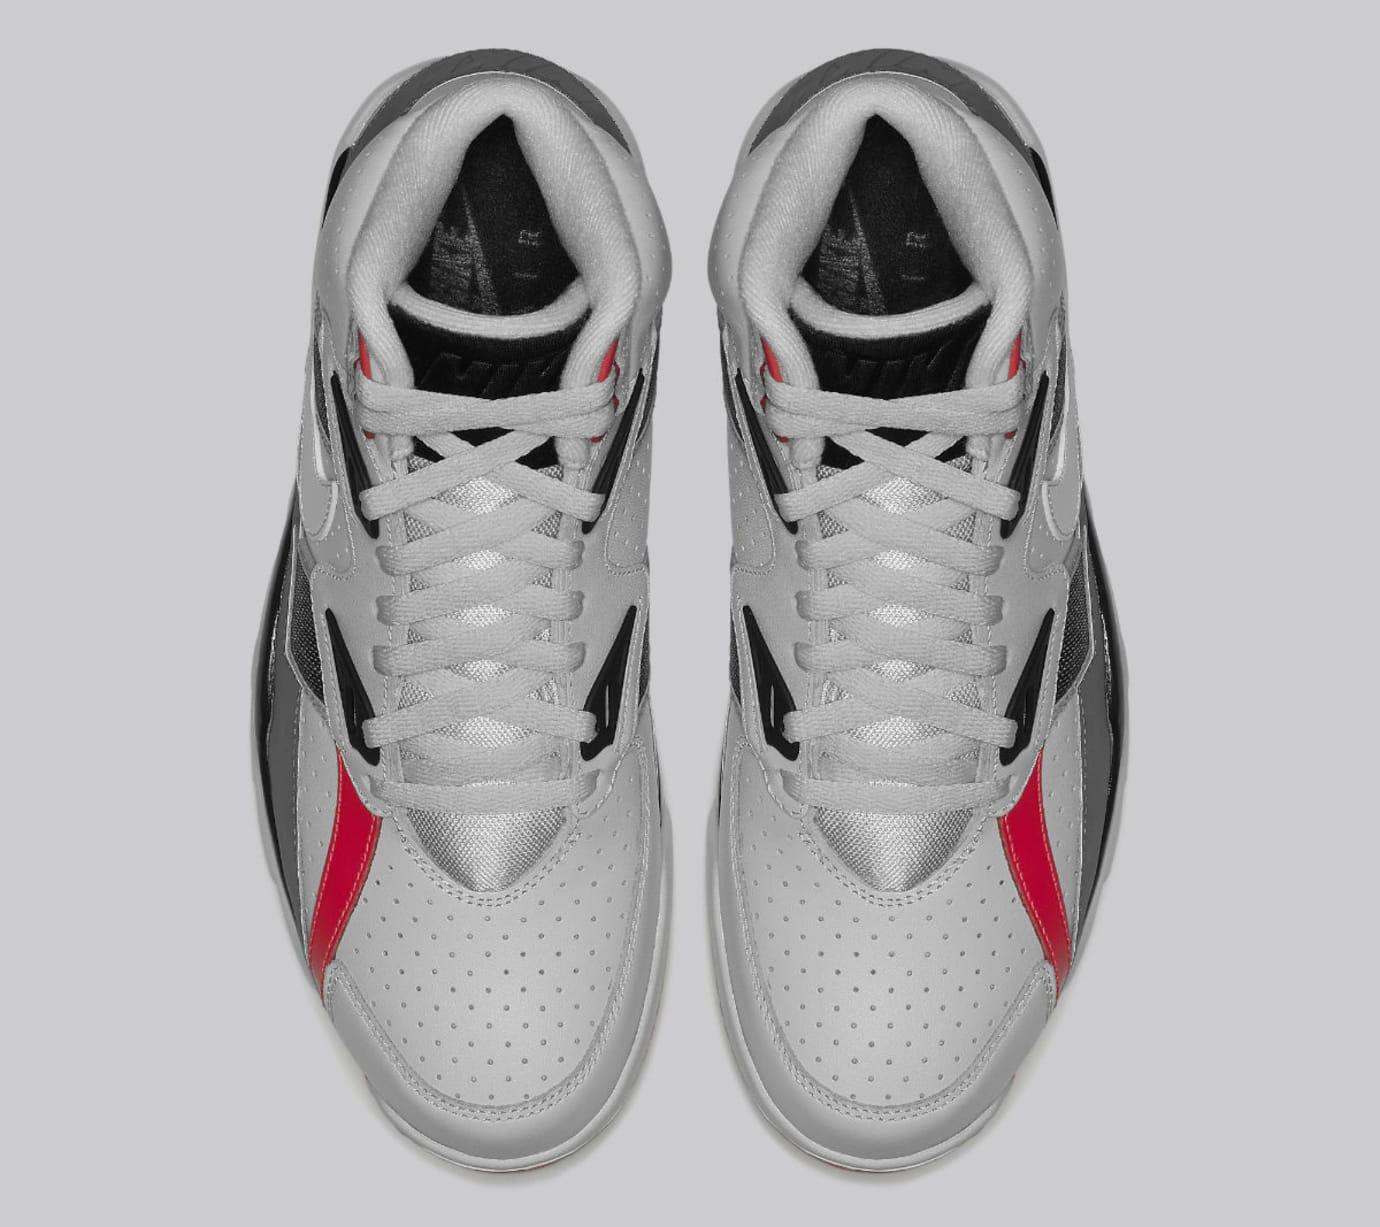 Nike Air Trainer SC High Vast Grey Release Date 302346-020 Top